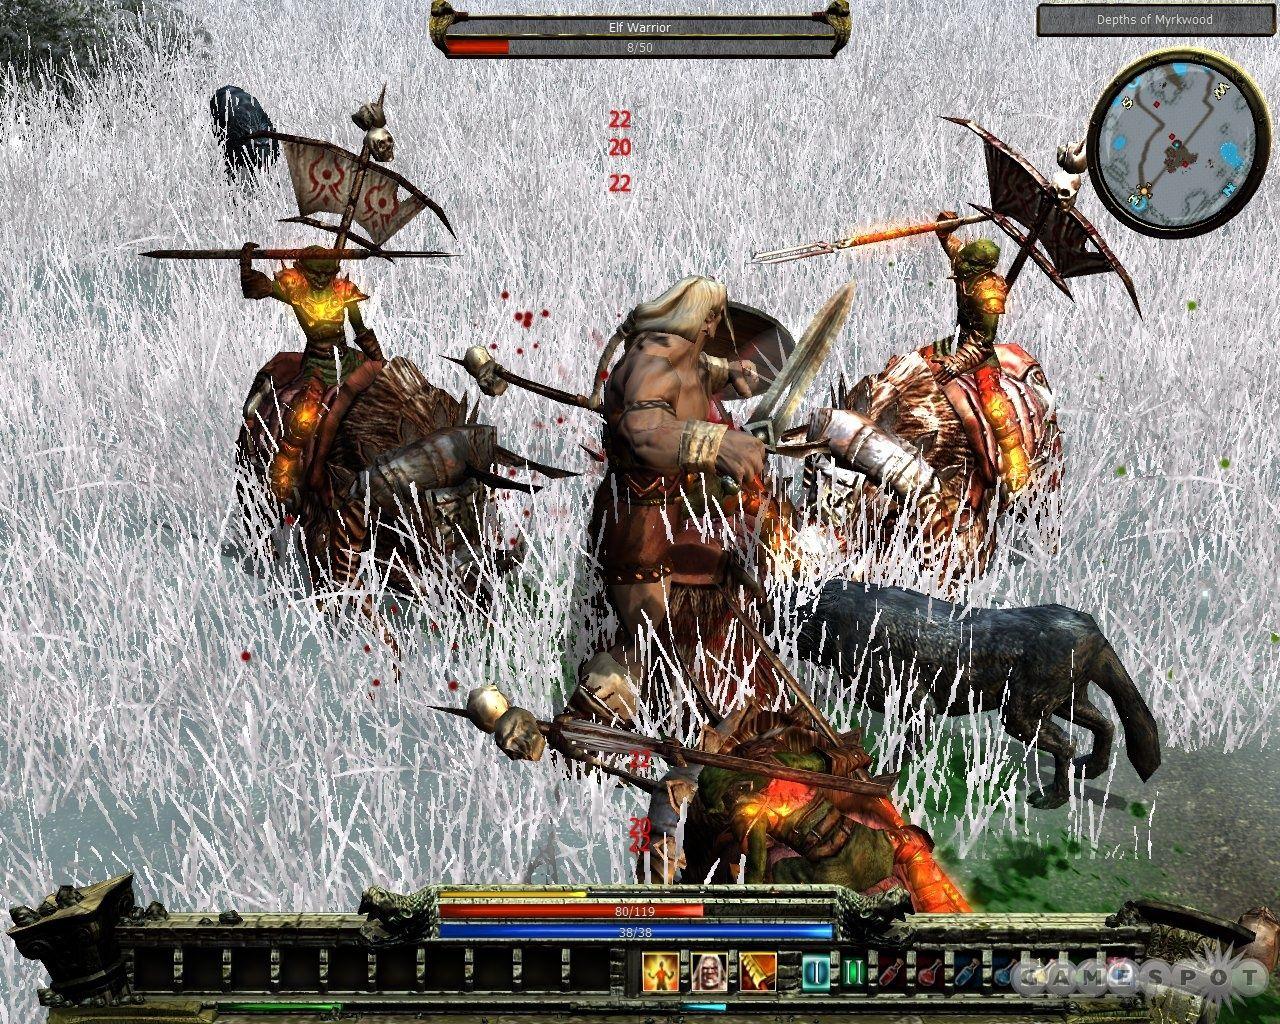 Pin by Richard Alley on Torrents Games Loki, Mythology, Hero